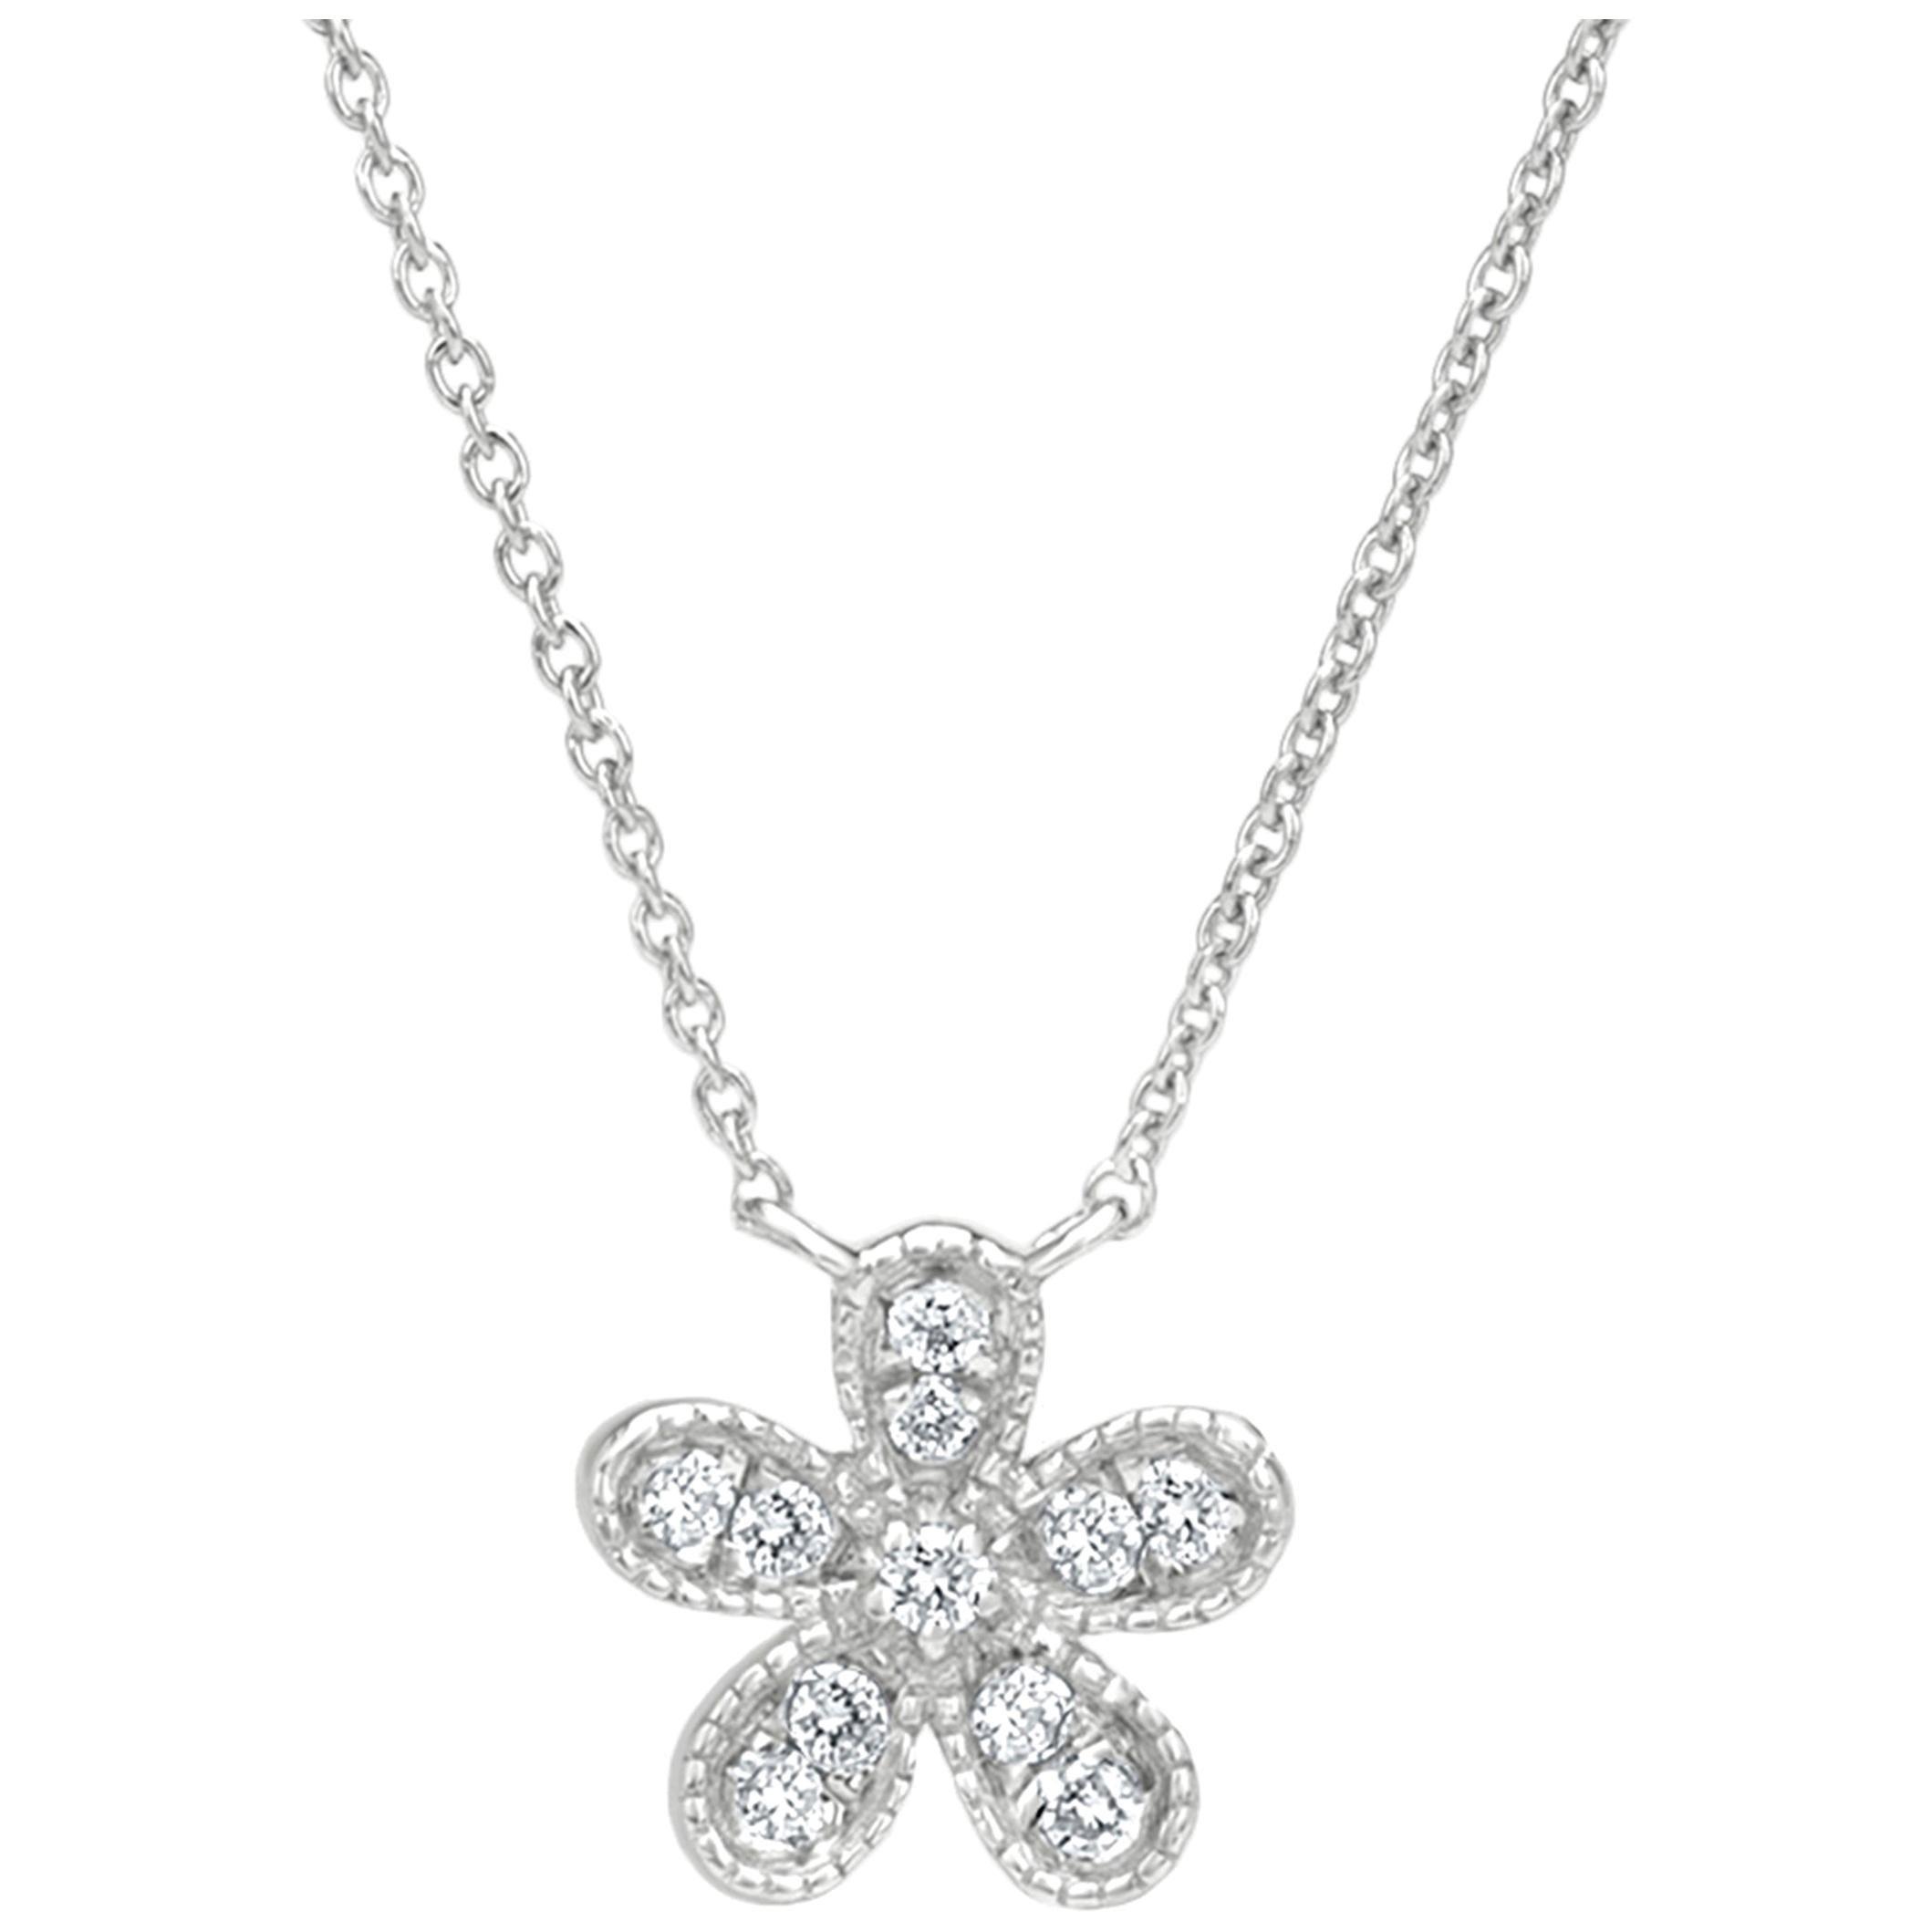 Flower Diamond Pendant Necklace in 18k White Gold